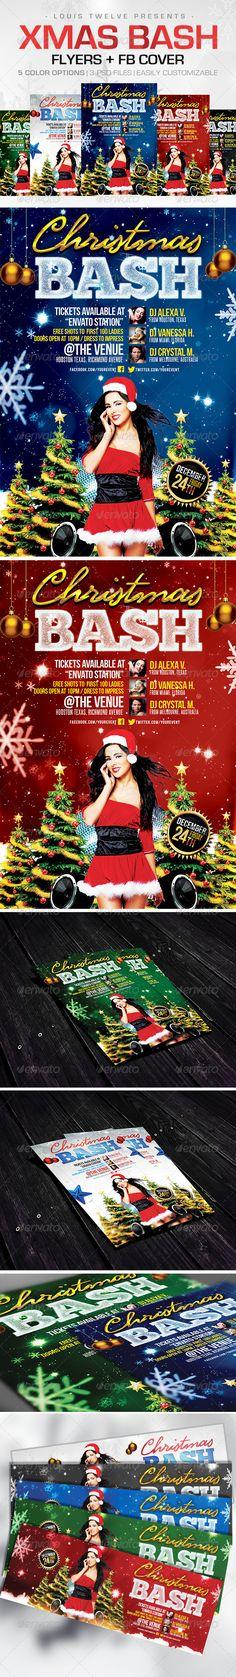 Christmas Bash | Flyers + FB Cover — Photoshop PSD #xmas bash #creative • Available here → https://graphicriver.net/item/christmas-bash-flyers-fb-cover/6076635?ref=pxcr